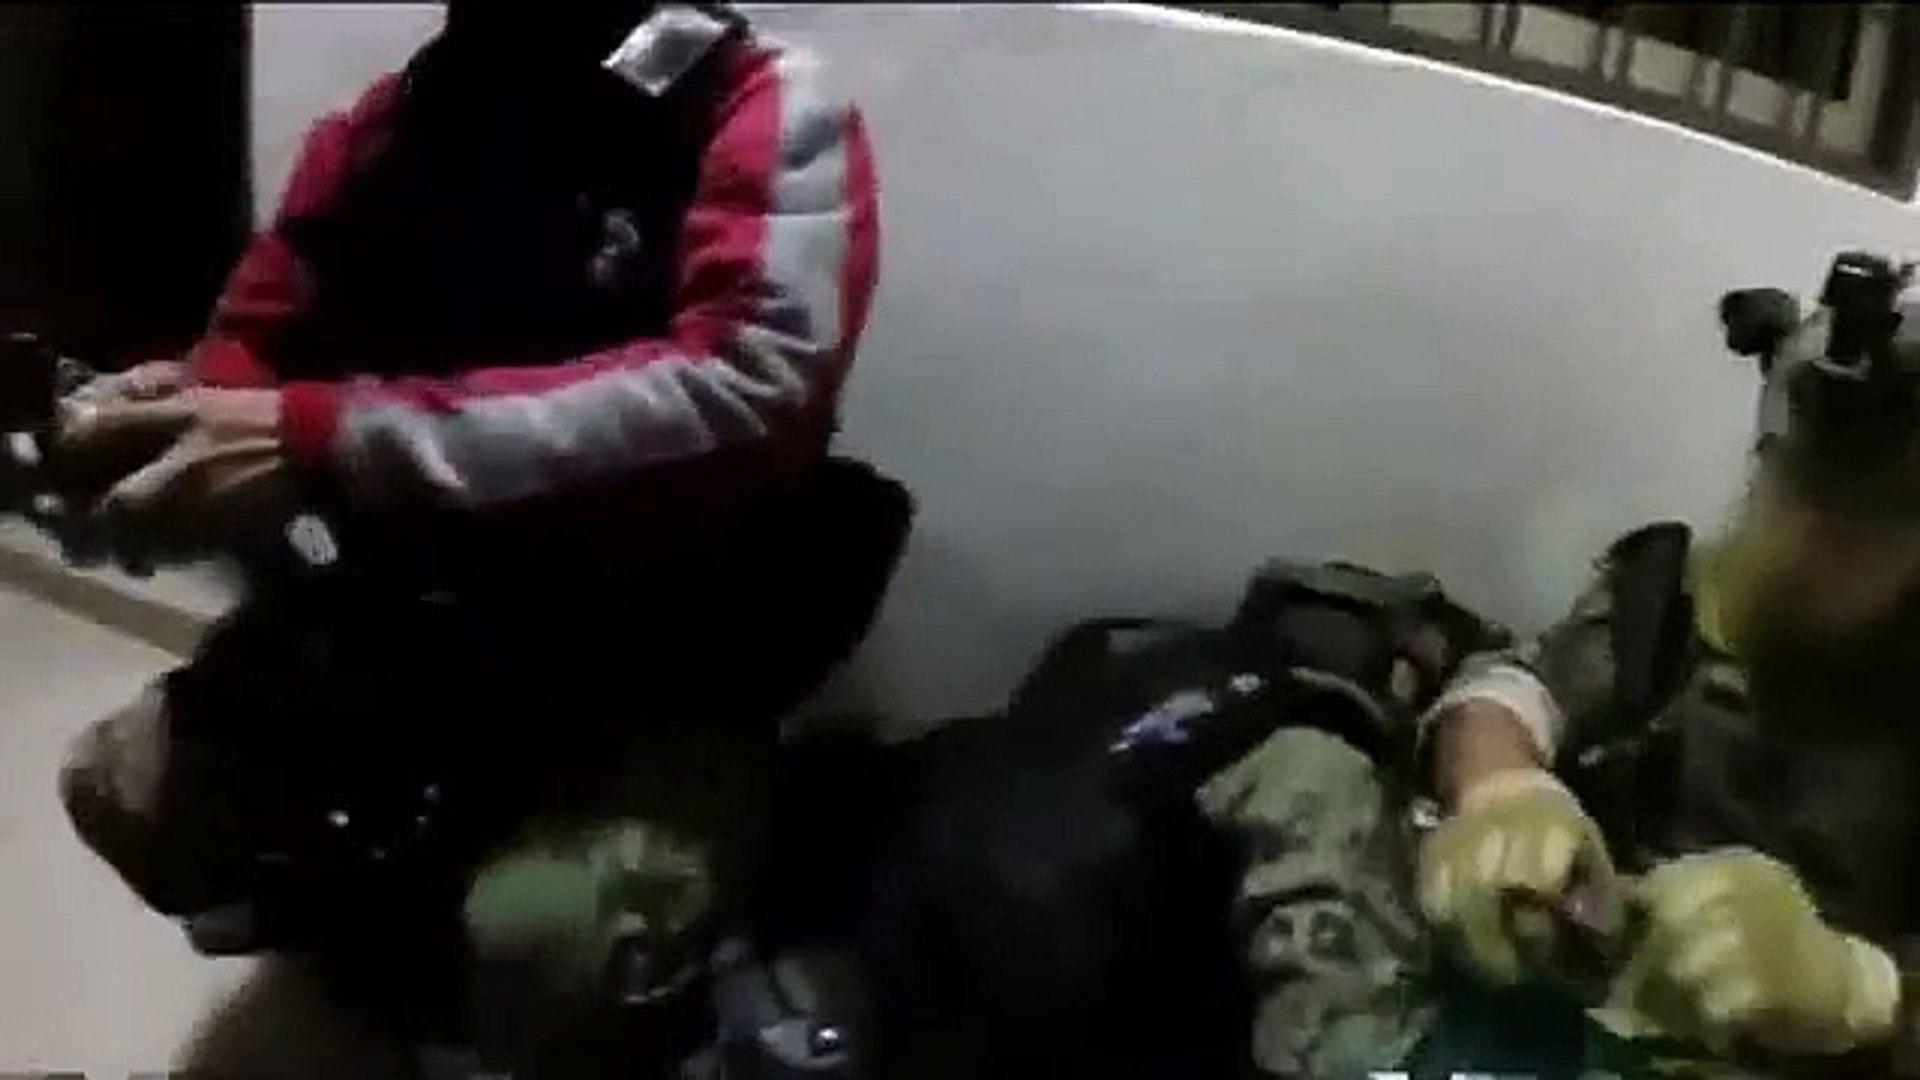 El Chapo Guzman: Dramatic footage shows moment drug lord was captured - BBC News (News World)